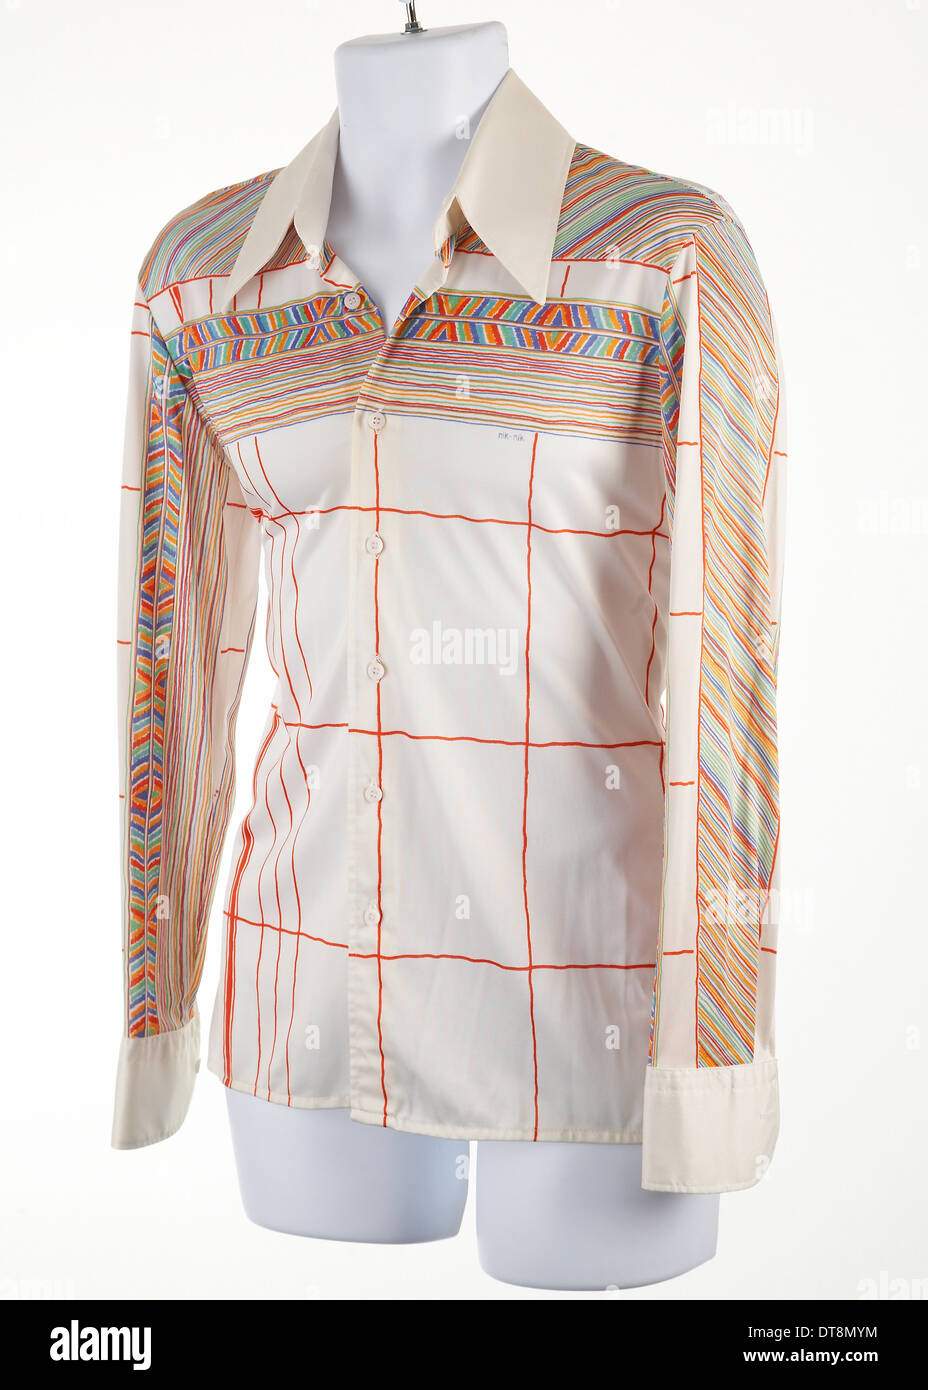 Vintage Nik Nik 1970's disco shirt on a mannequin. - Stock Image